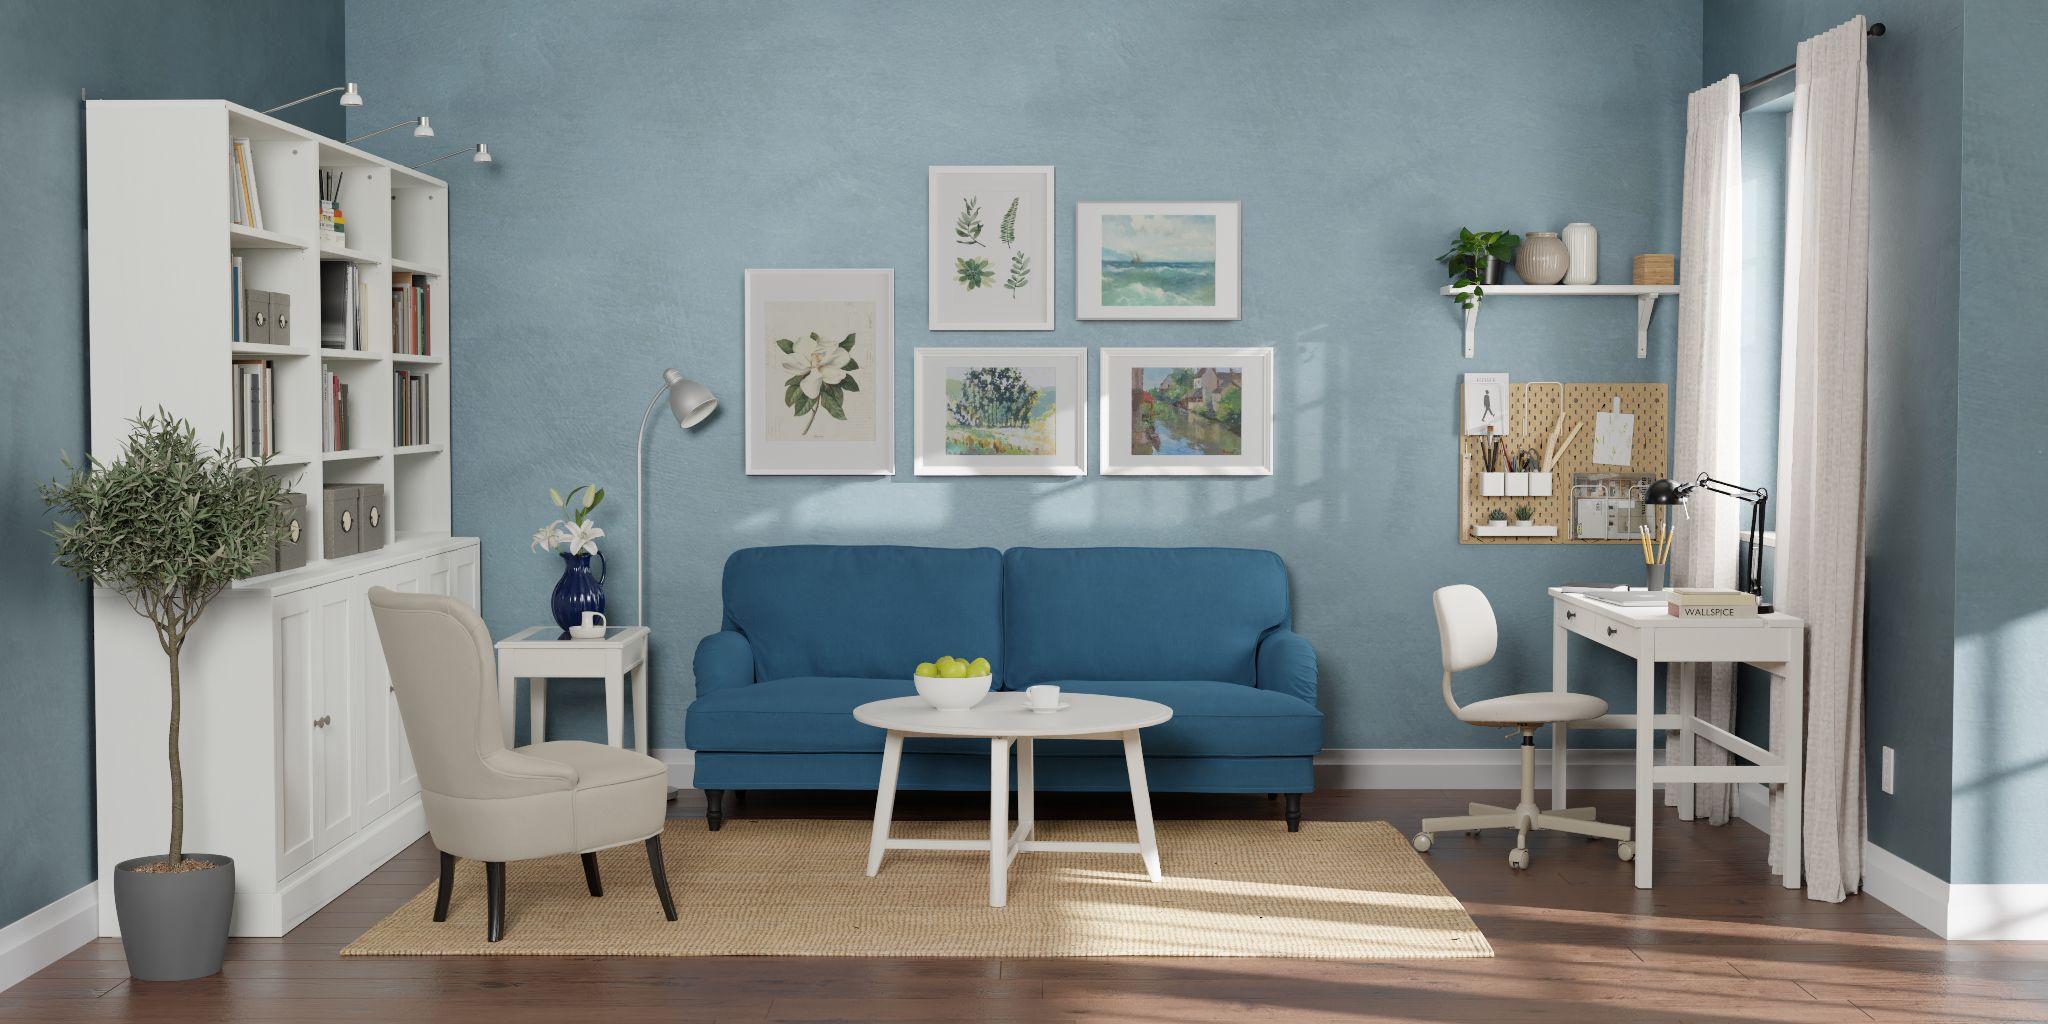 Living Room Furniture Décor Ikea, Ikea Living Room